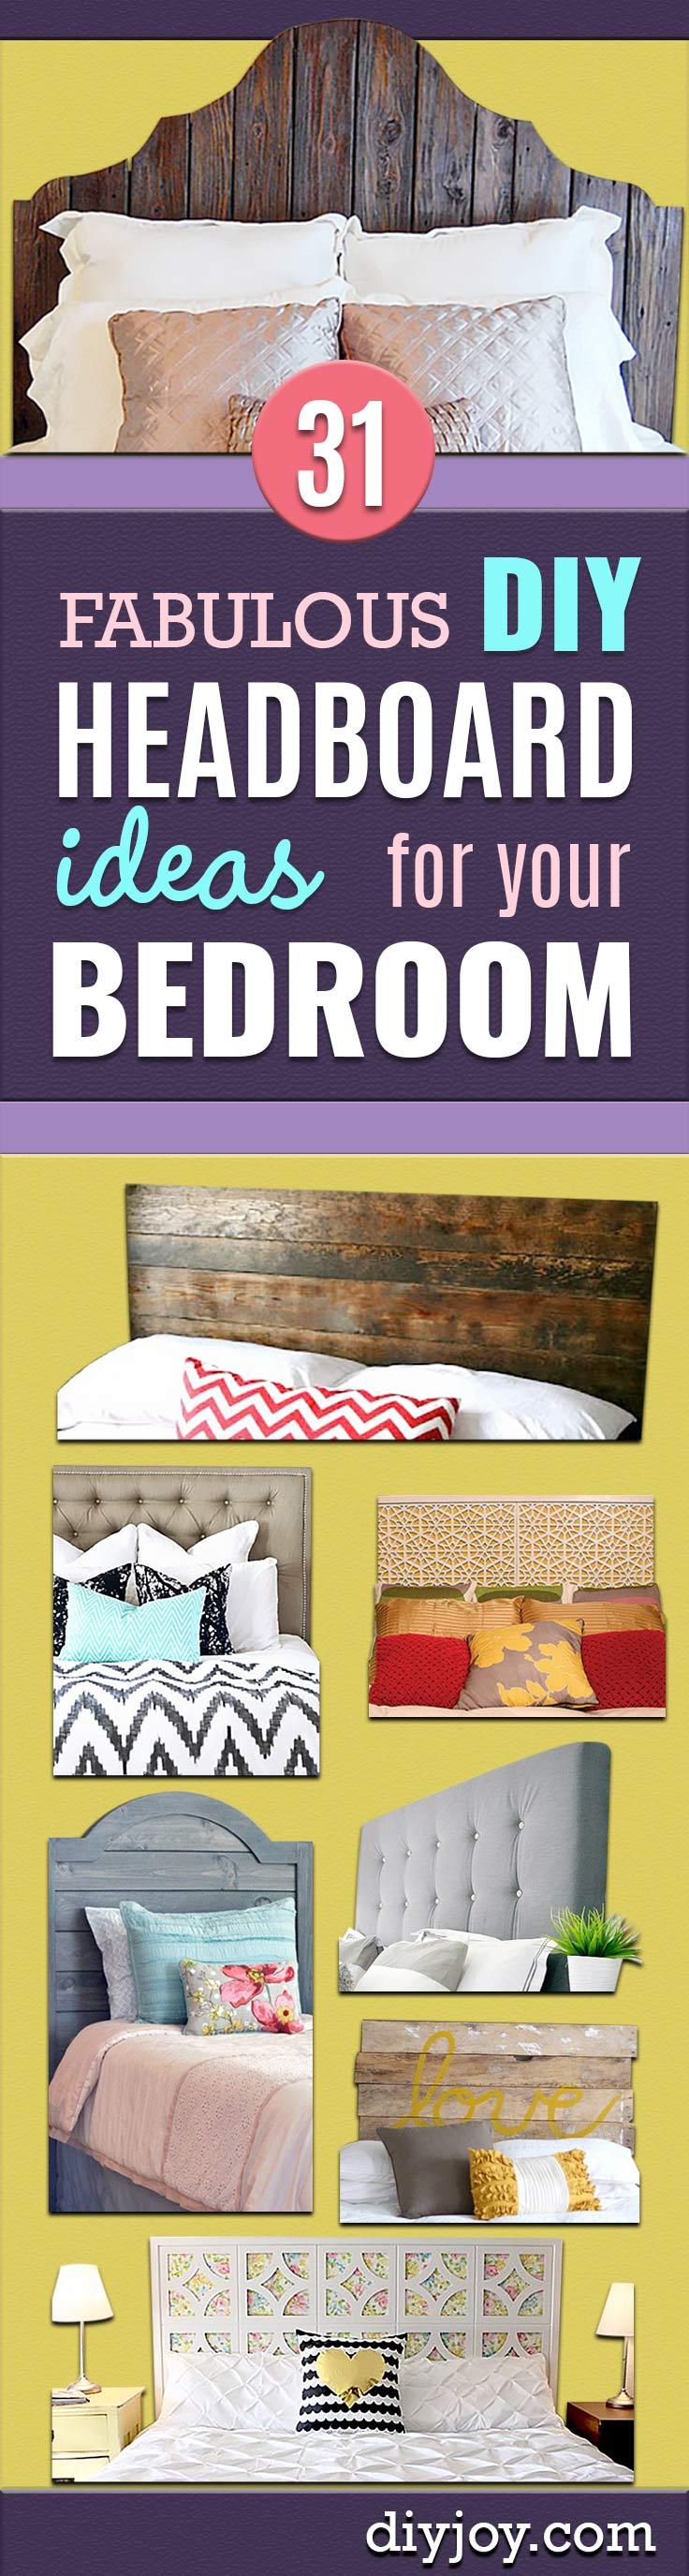 31 fabulous diy headboard ideas for your bedroom diy joy diy headboard ideas easy and cheap do it yourself headboards upholstered wooden